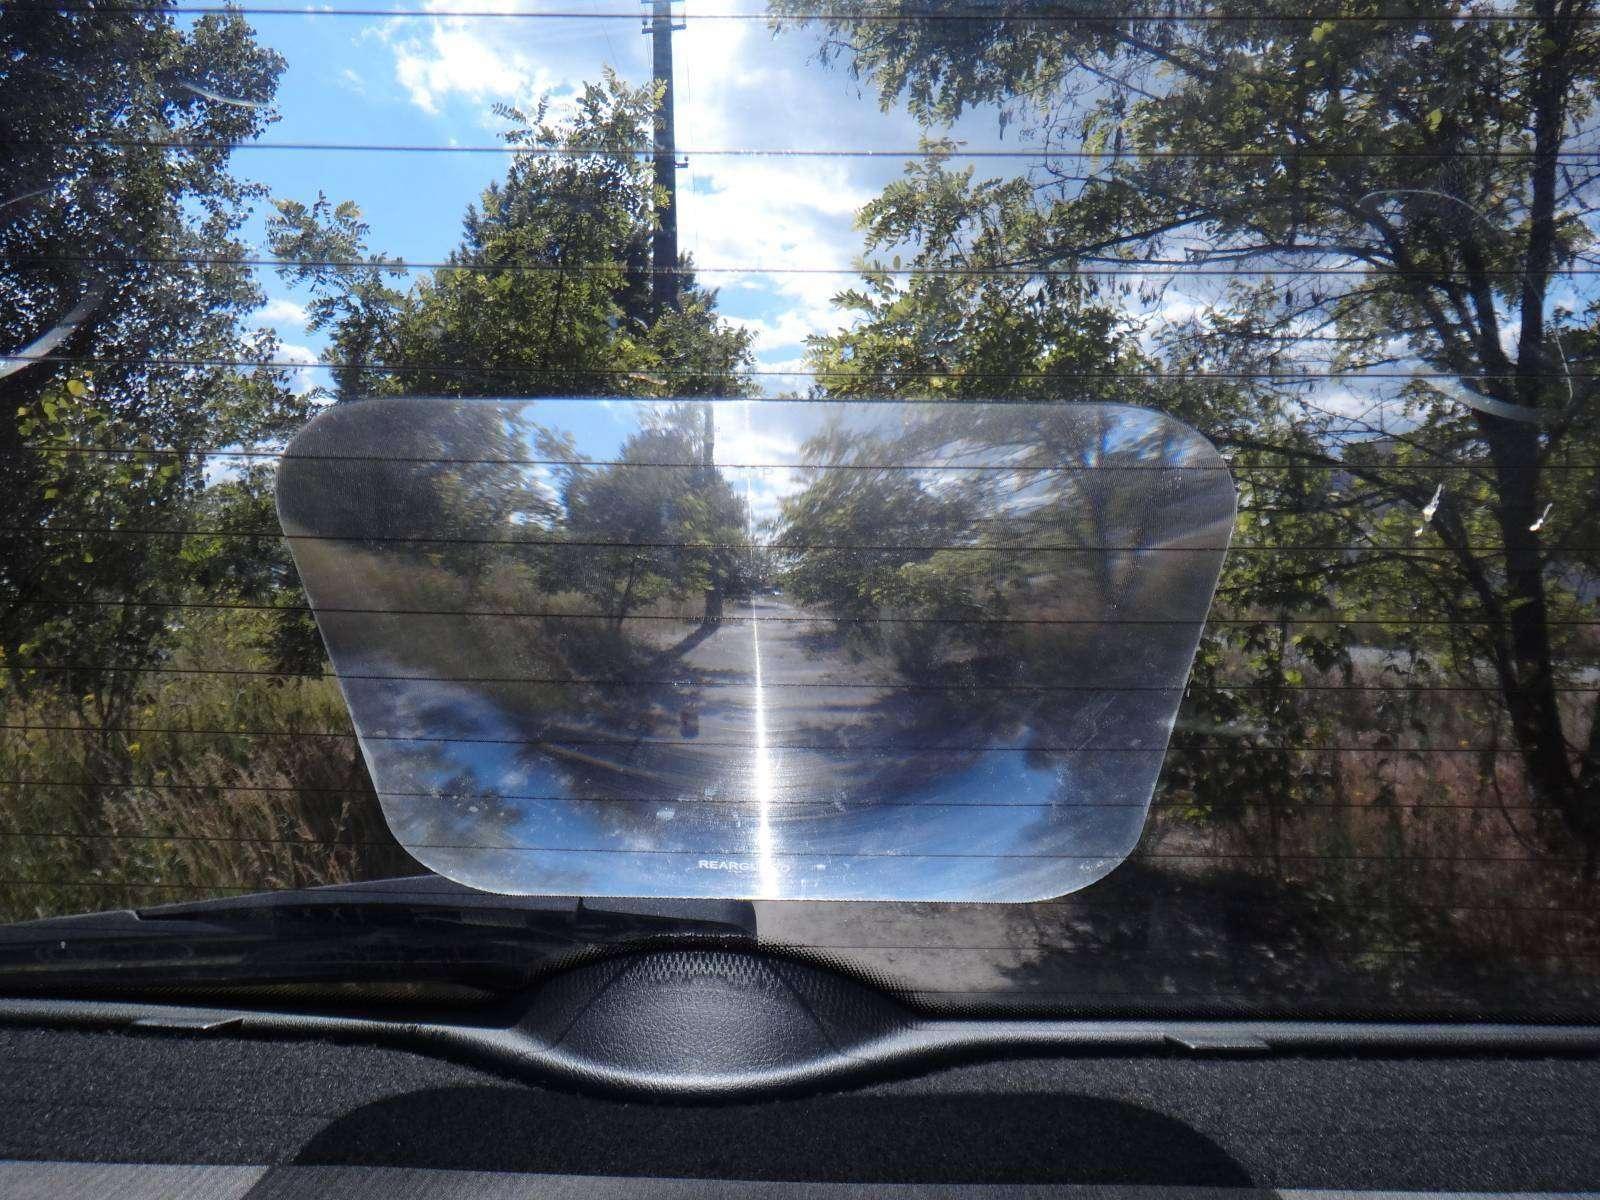 Aliexpress: Линза Френеля или как заменить парктроник и камеру куском пластика